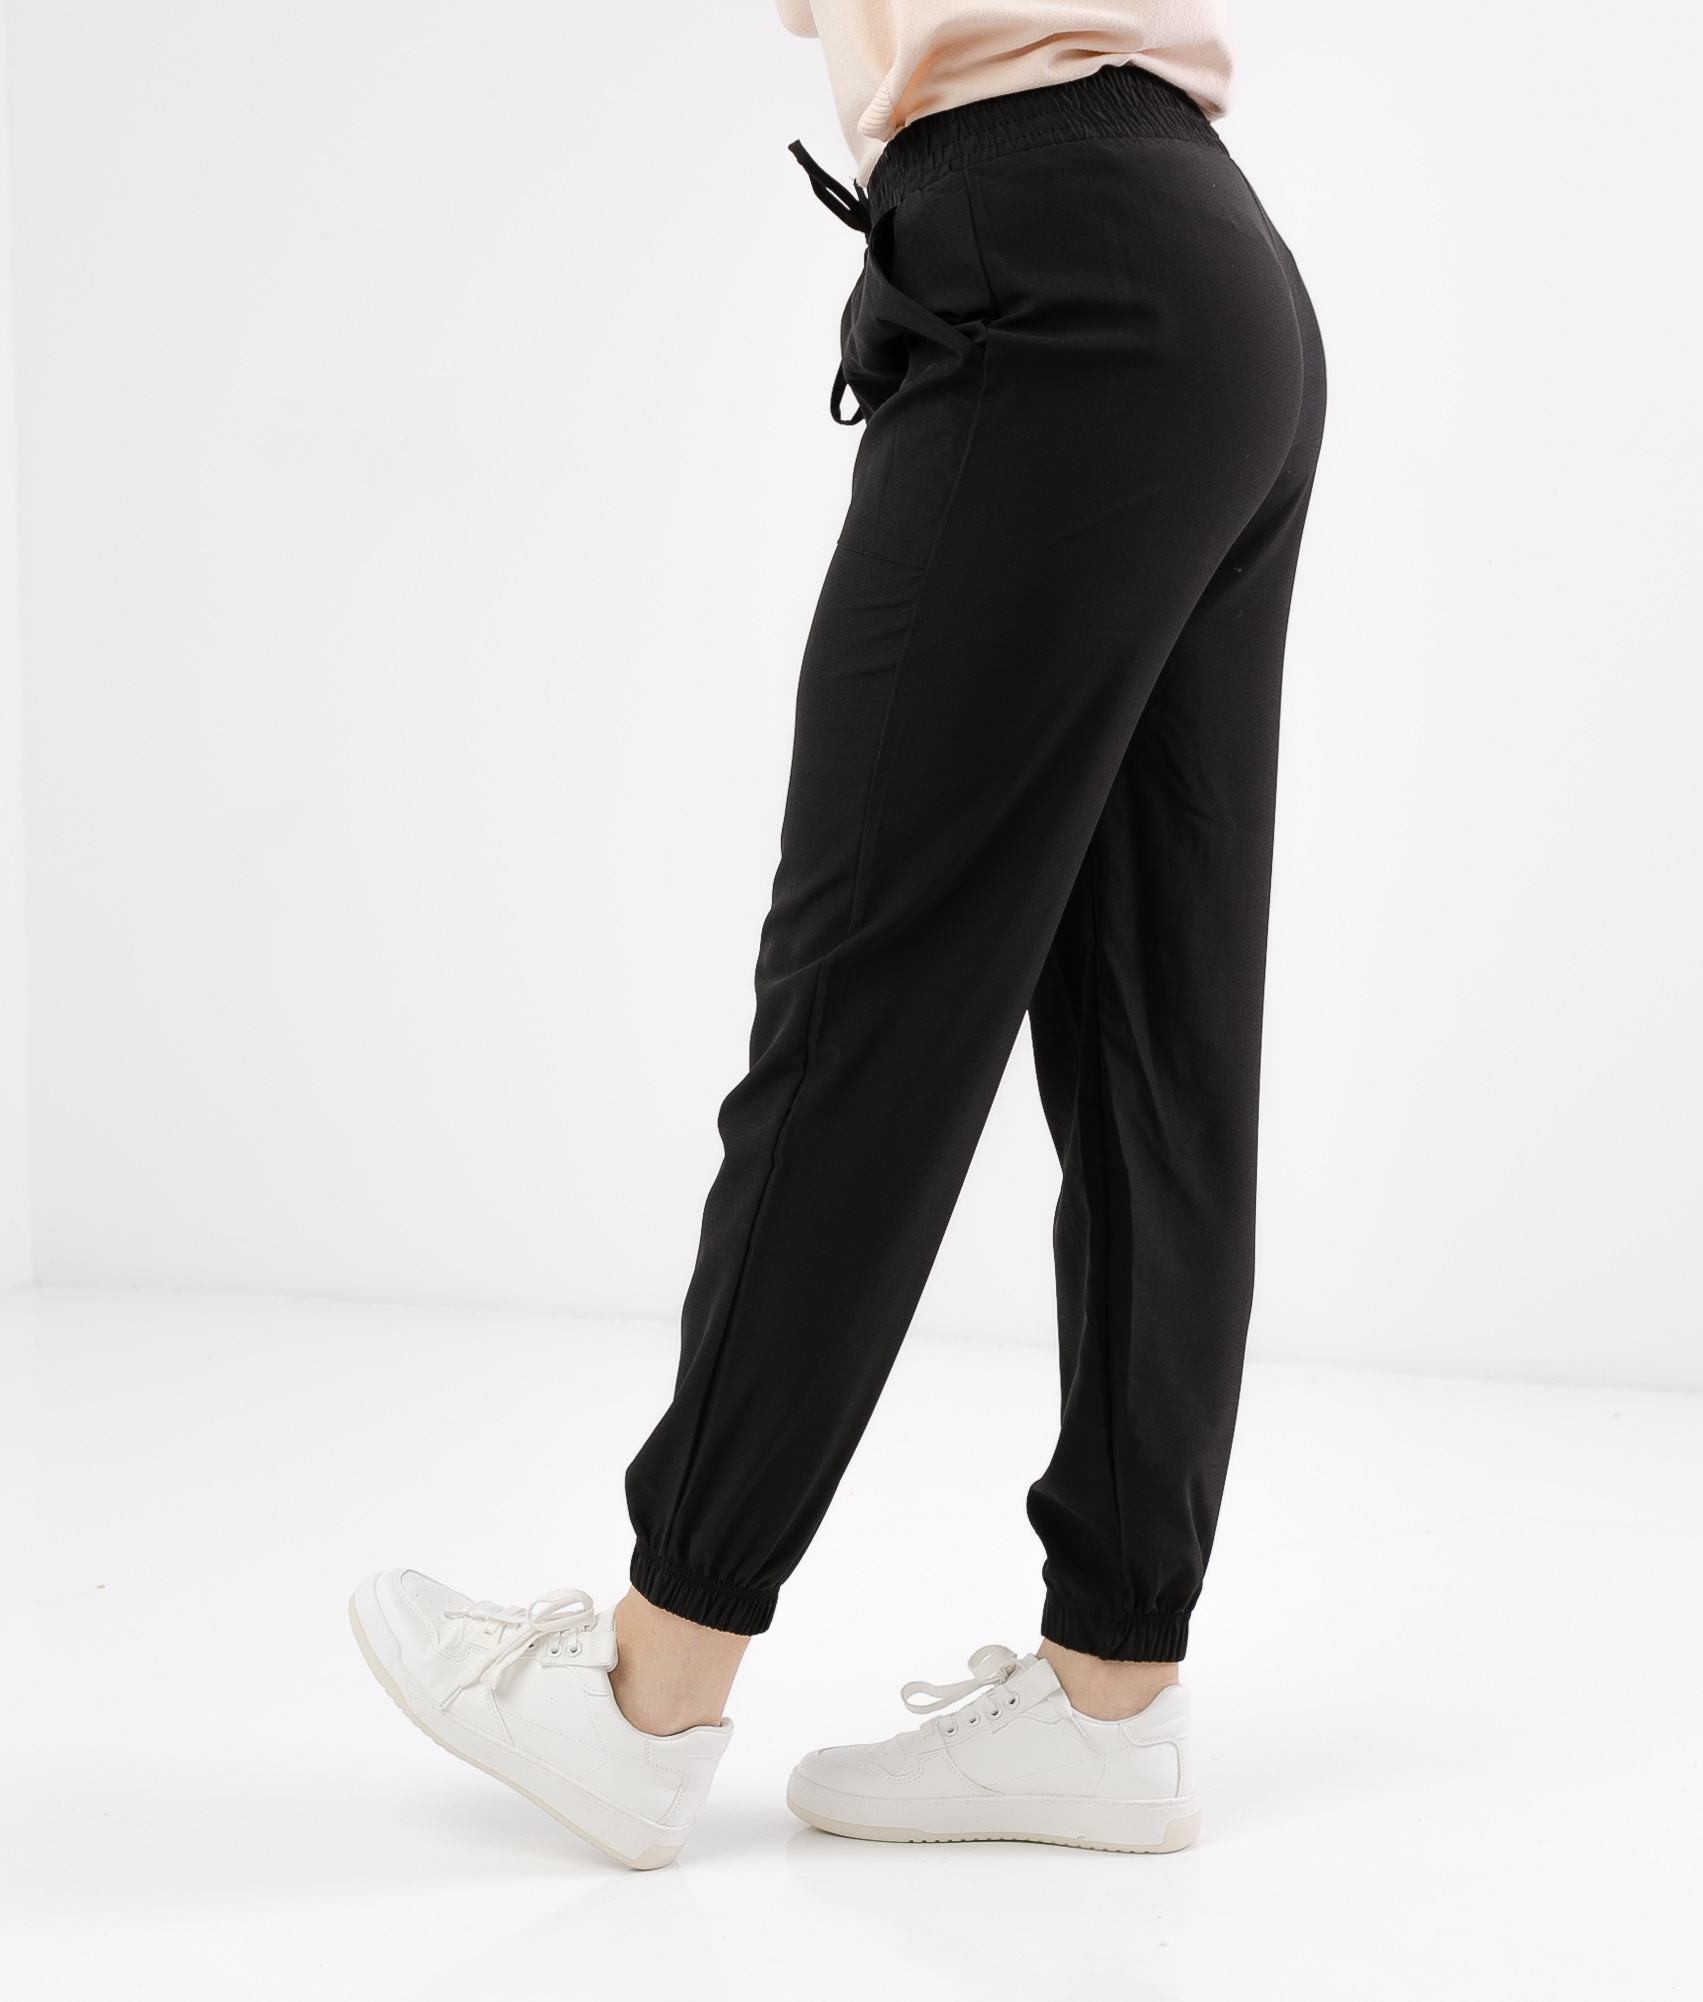 Pantalón Finber - Black